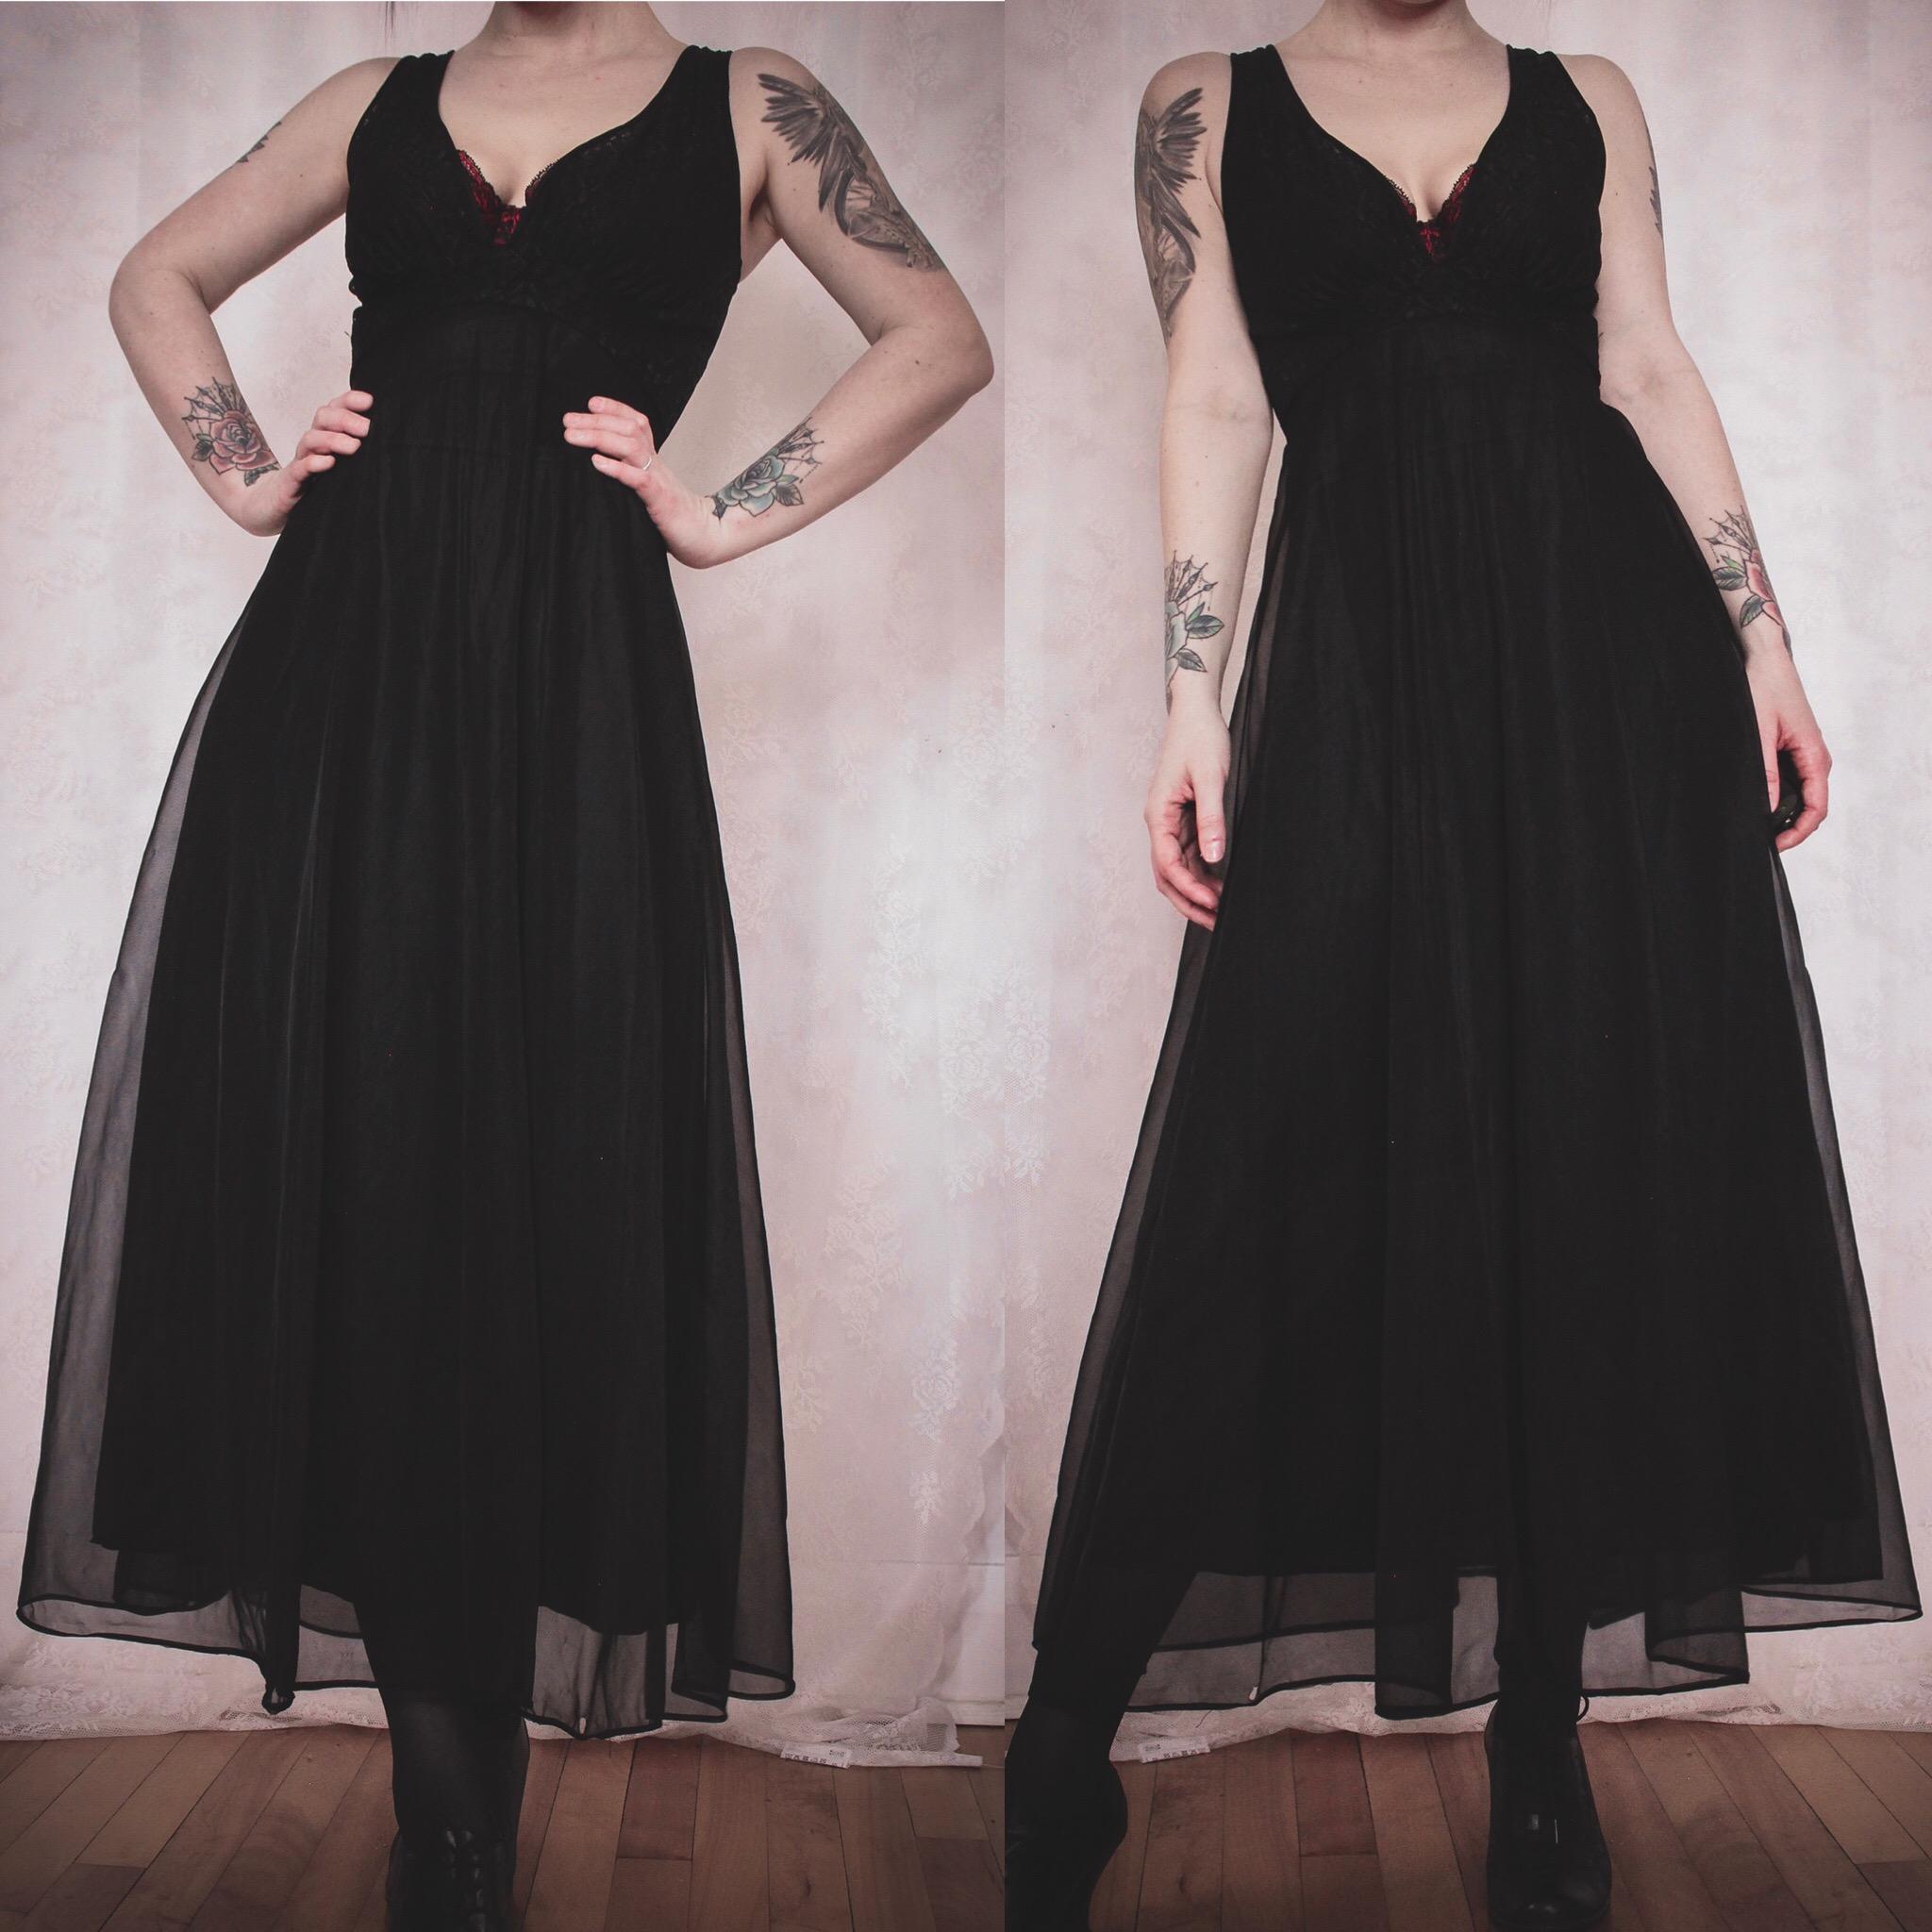 c7a8db4a2e80 Vintage 80s Black Lace & Chiffon Dressing Gown · Last Rites · Online ...